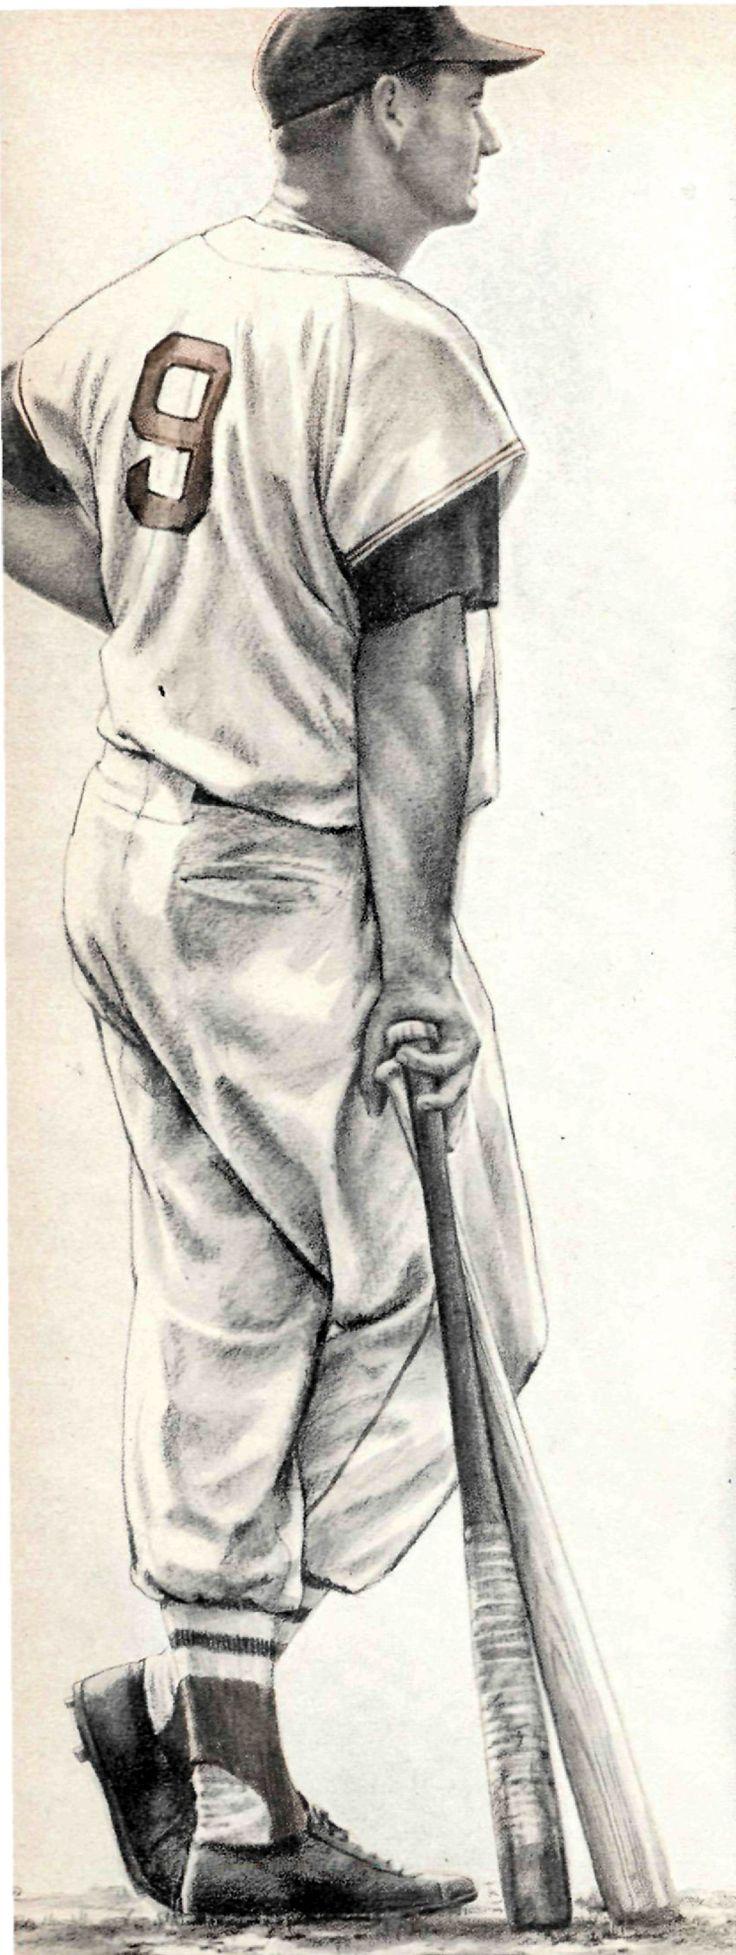 Robert Riger illustration of Red Sox slugger Ted Williams.